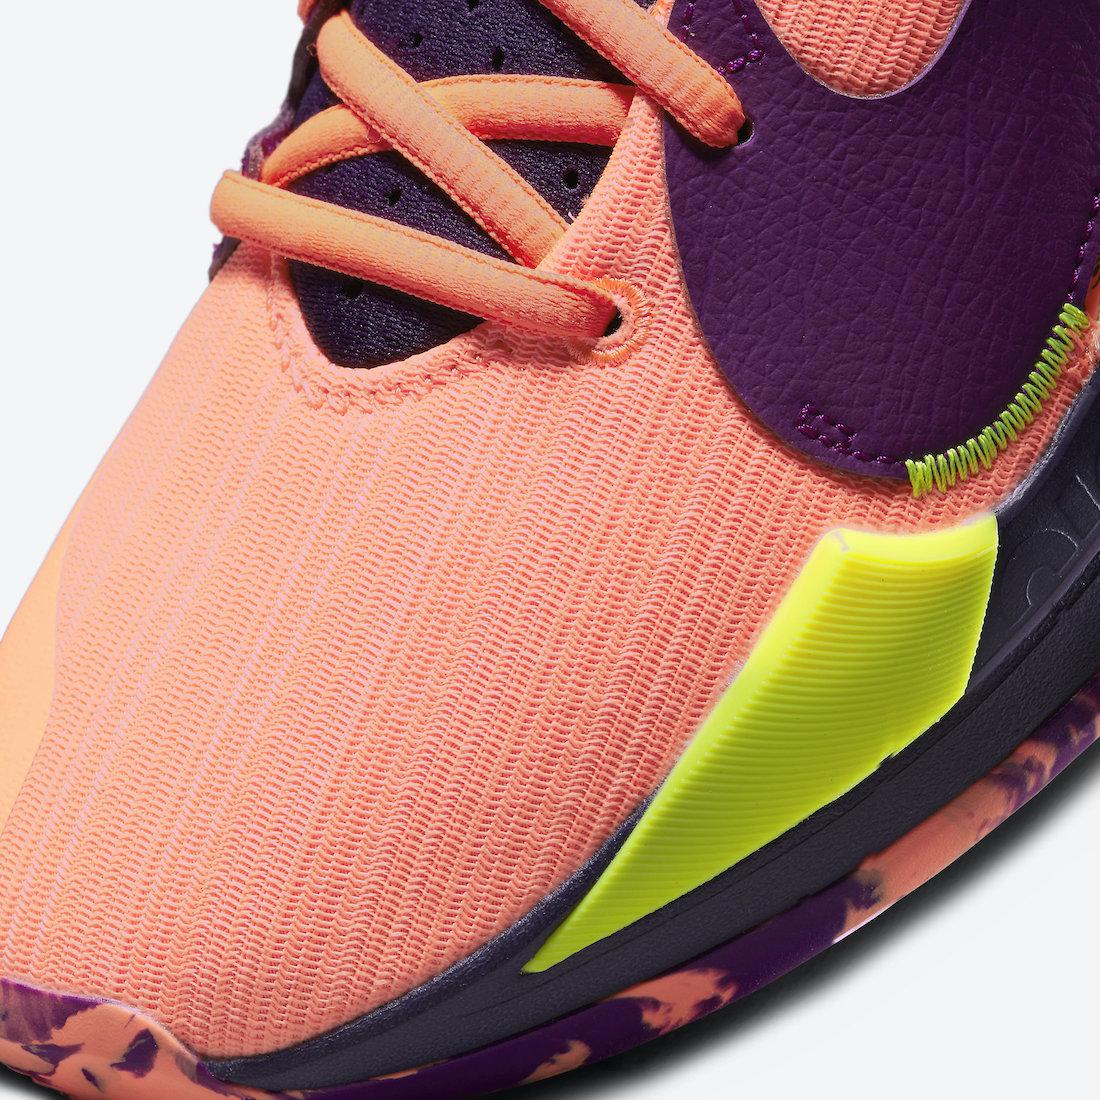 Nike-Zoom-Freak-2-Bright-Mango-CW3162-800-Release-Date-6